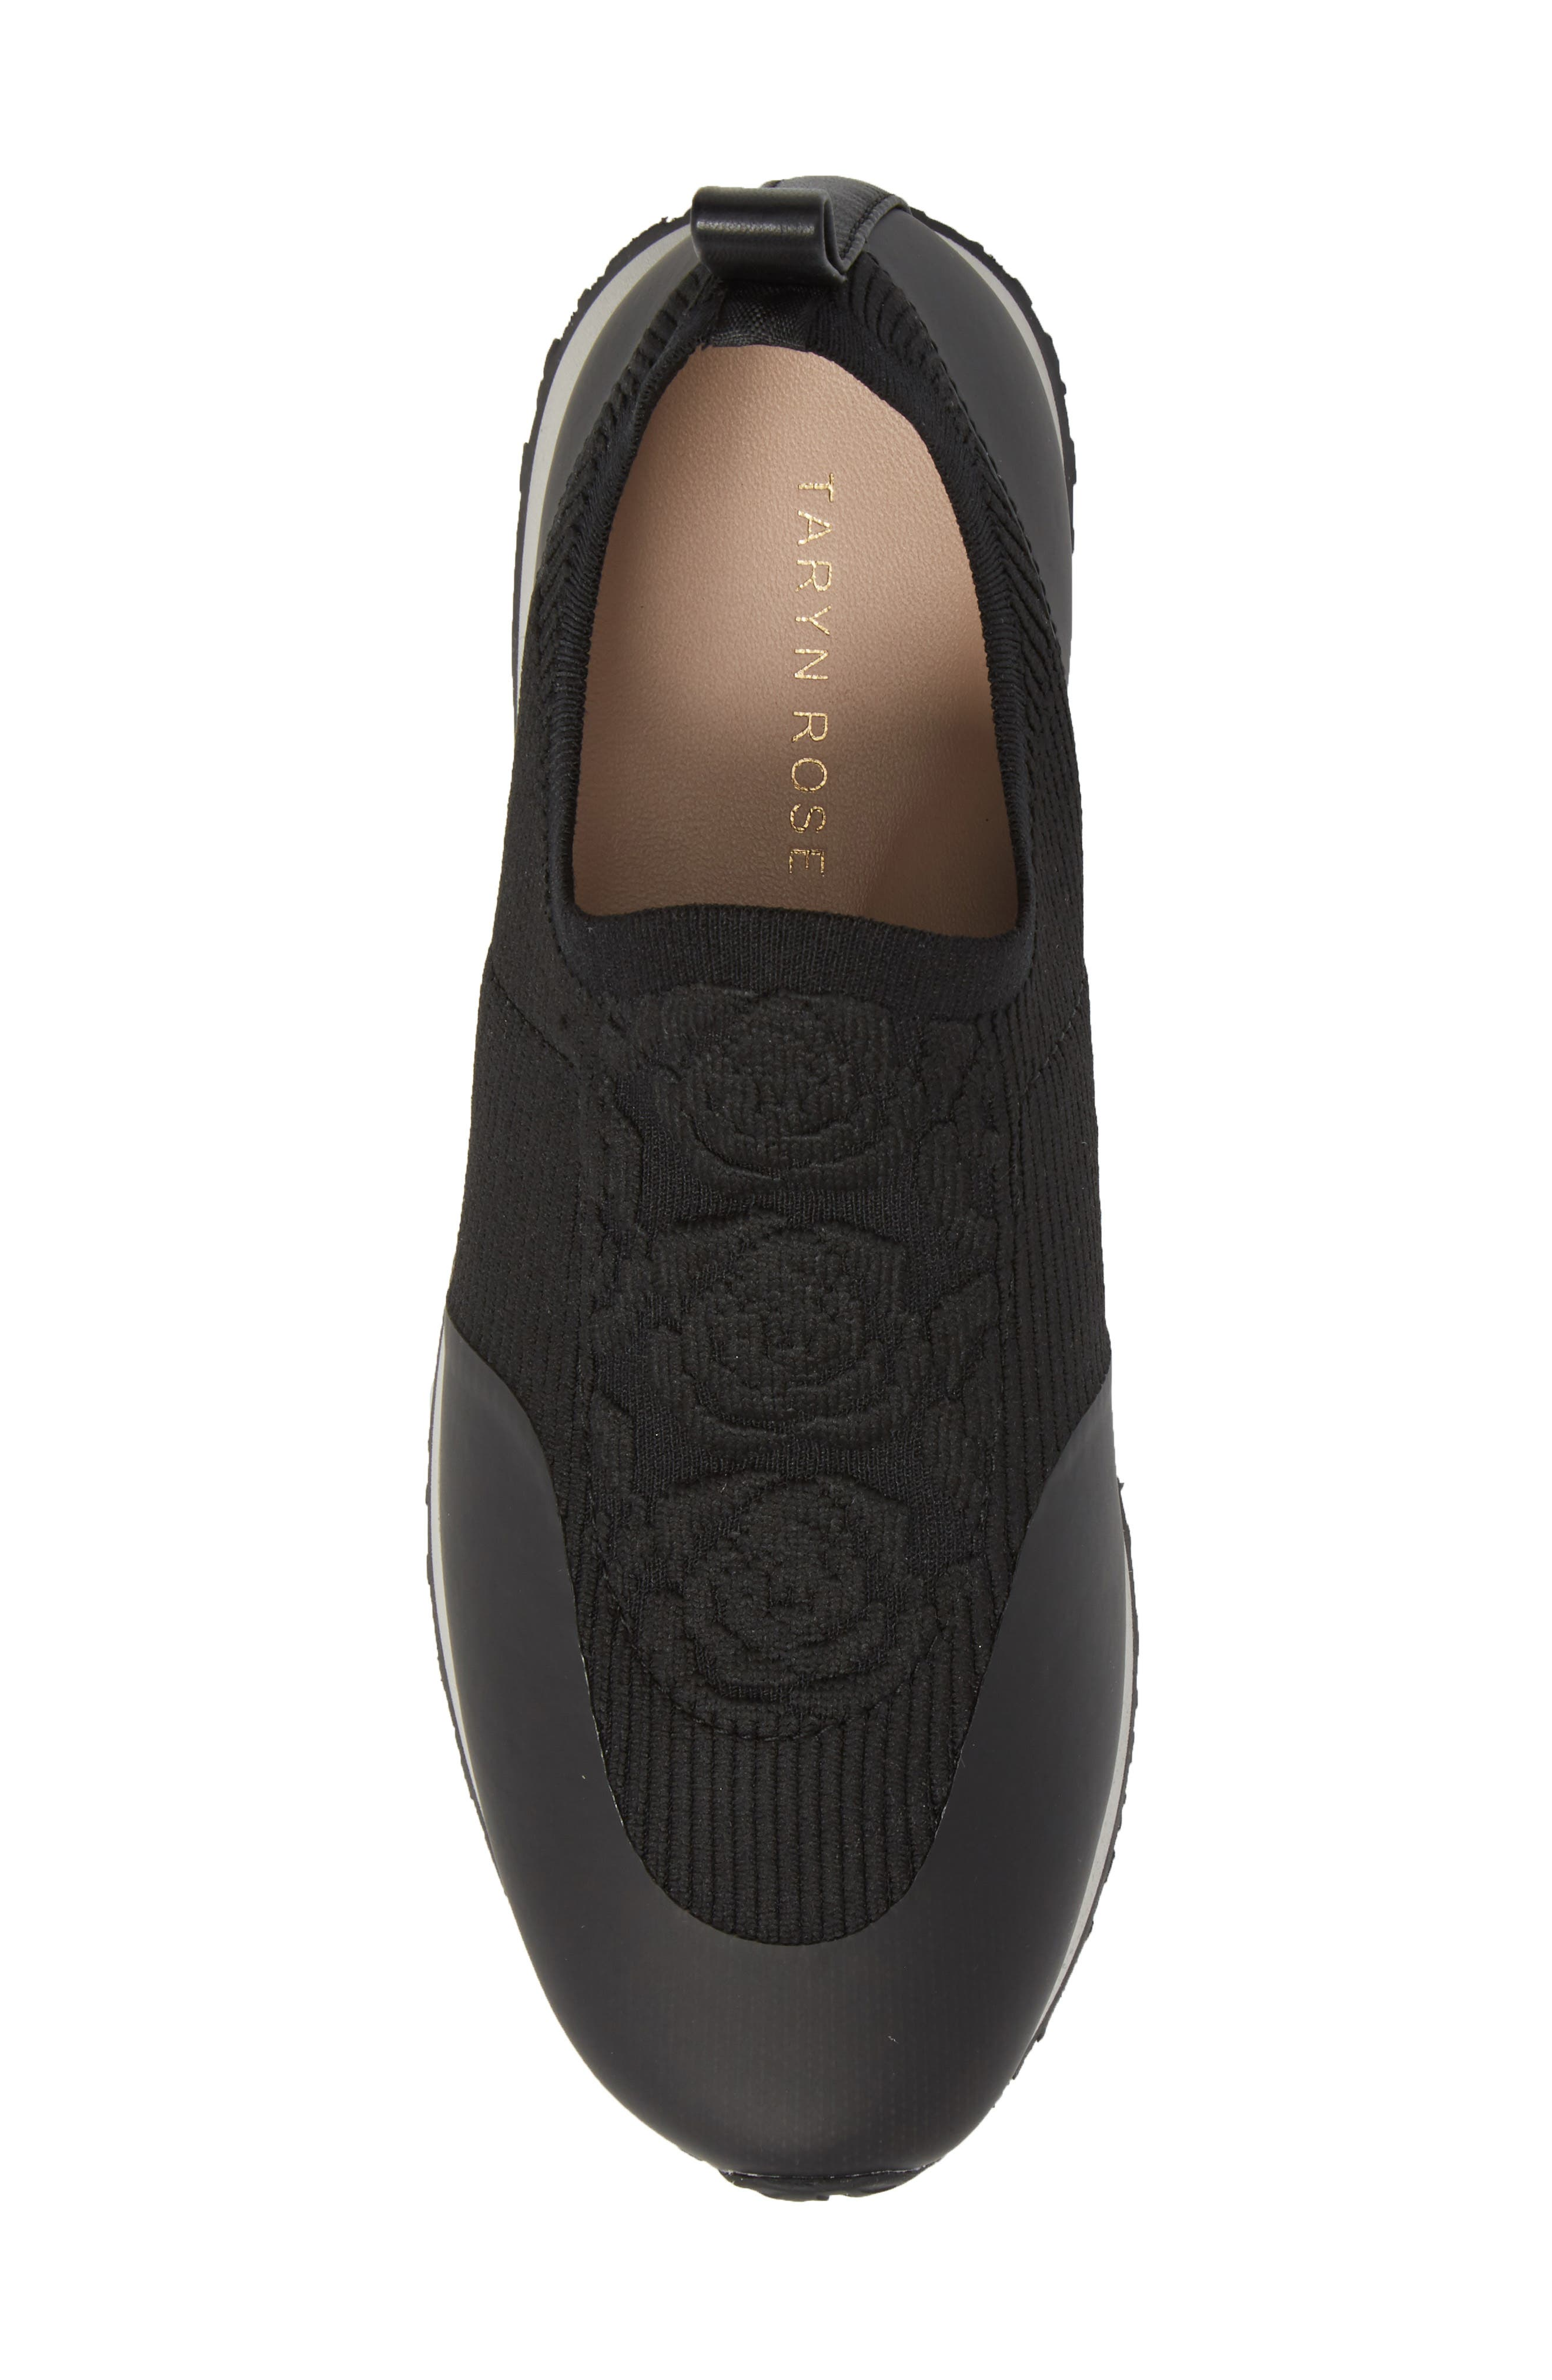 Cara Slip-On Sneaker,                             Alternate thumbnail 5, color,                             Black Fabric